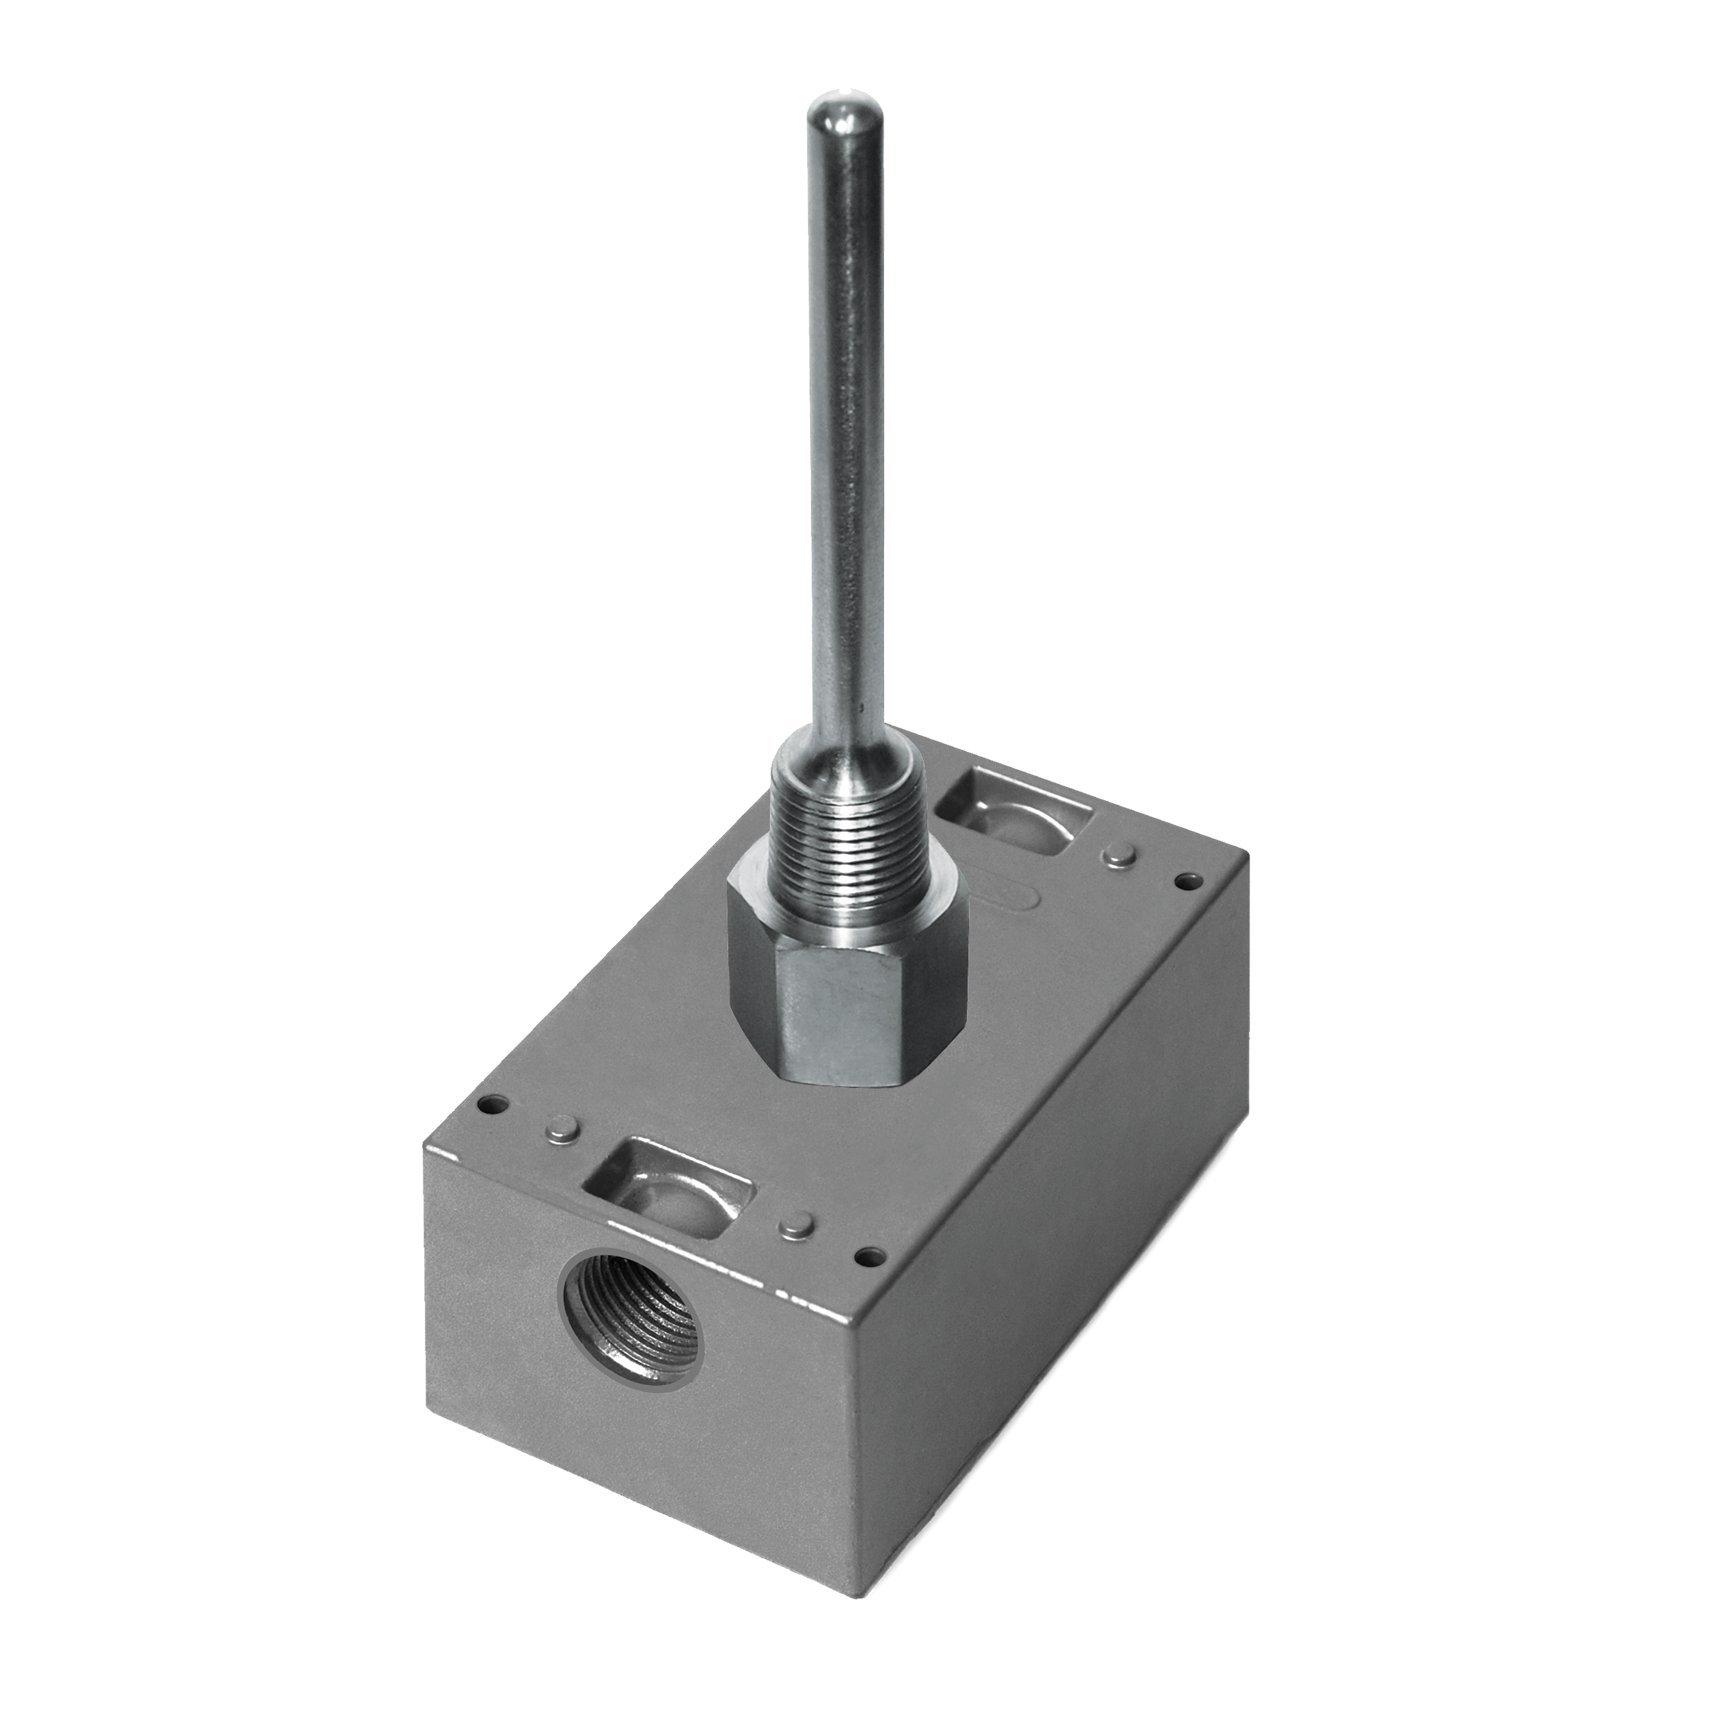 A/20K-I-4''-BB | ACI | 20K ohm | Stainless Steel Well Water Fluid Steam Temperature Sensor | Sensor Length: 4 inch | NEMA 3R (Bell Box) Housing Enclosure Box |